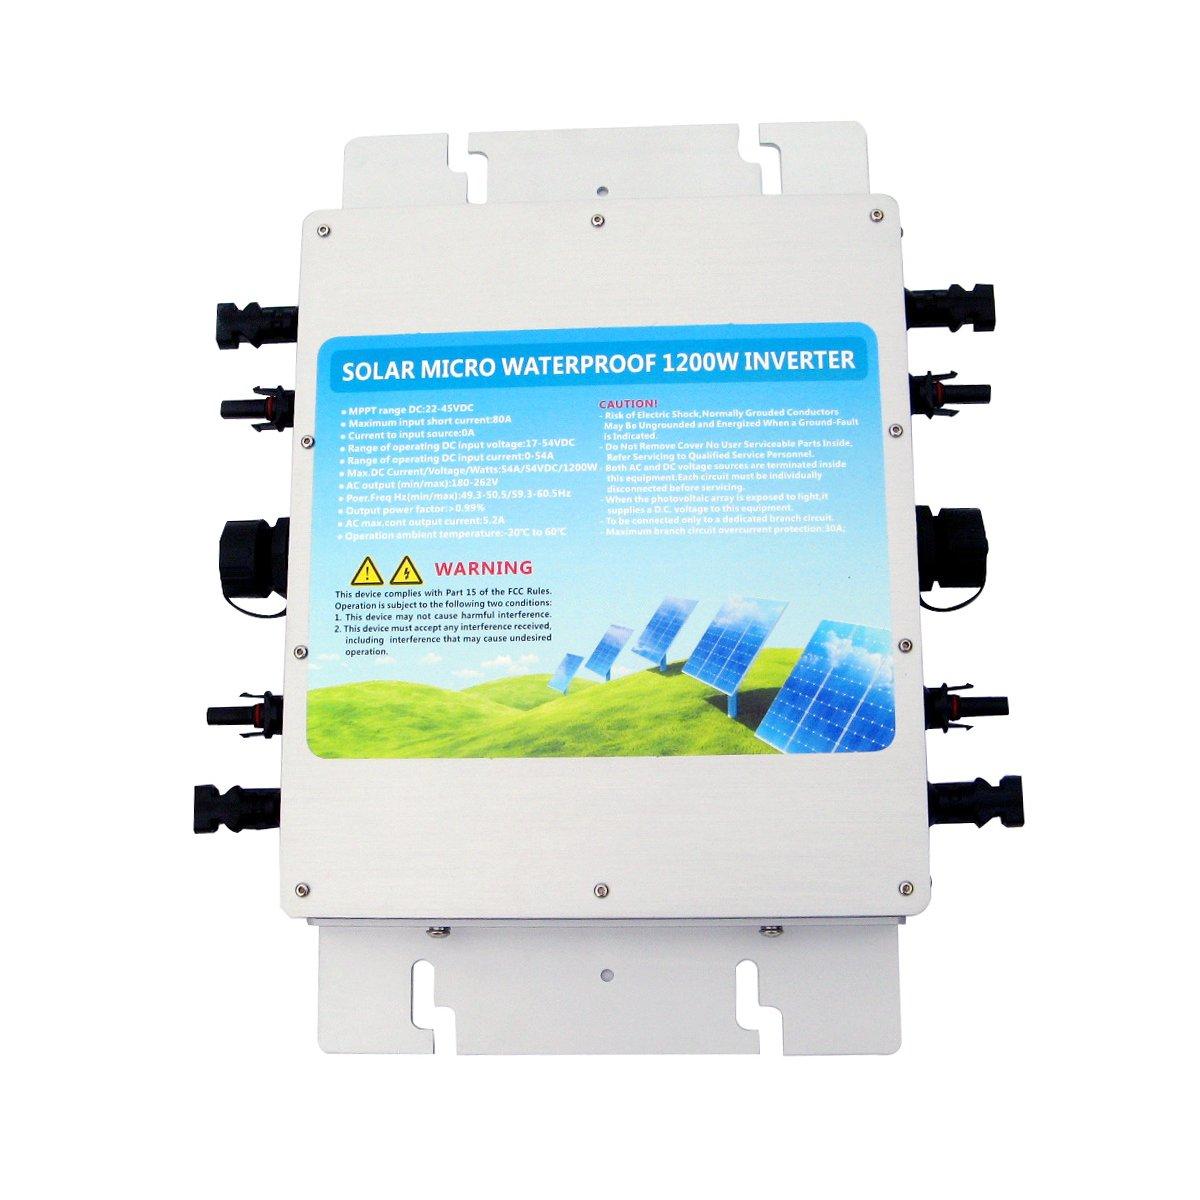 Eco Worthy 1200w Spannungswandler 24v To 230v Waterproof 70 260v Ac 180 350v Dc Voltage Converter Wechselrichter Grid Tie Power Inverter For Sonnenkollektor With Mppt Function